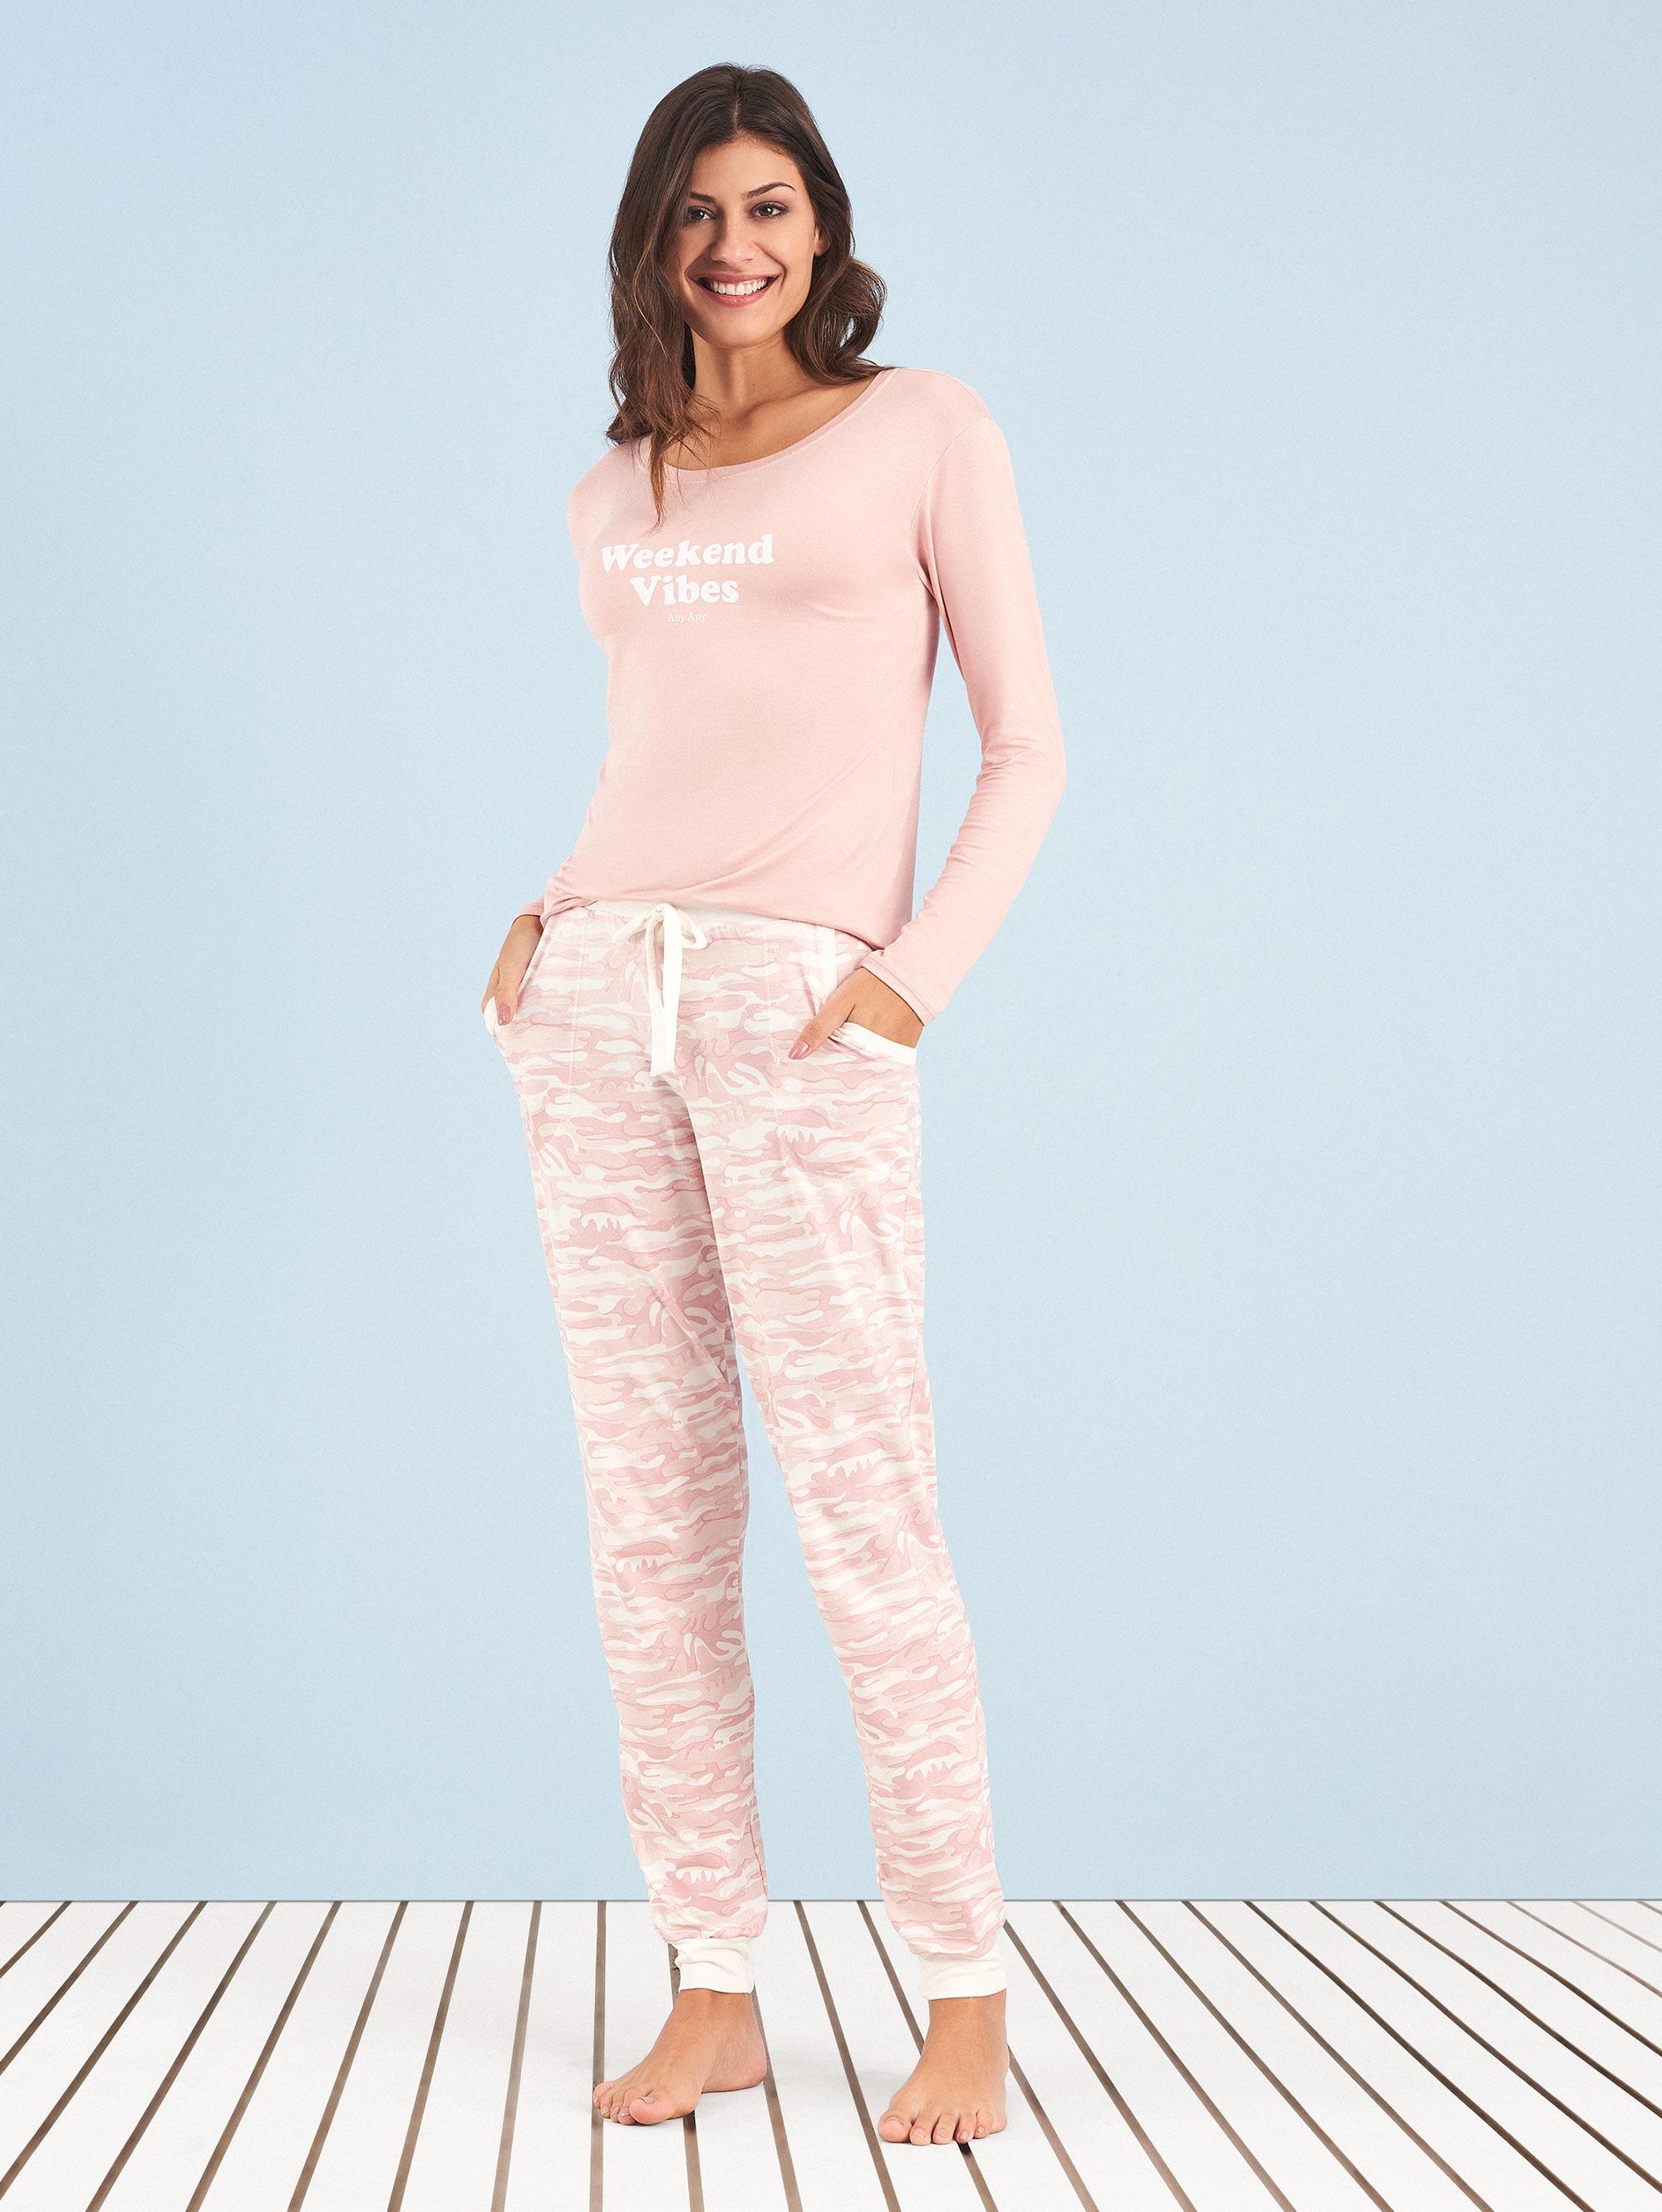 pijama-longo-manga-longa-weekend-vibes